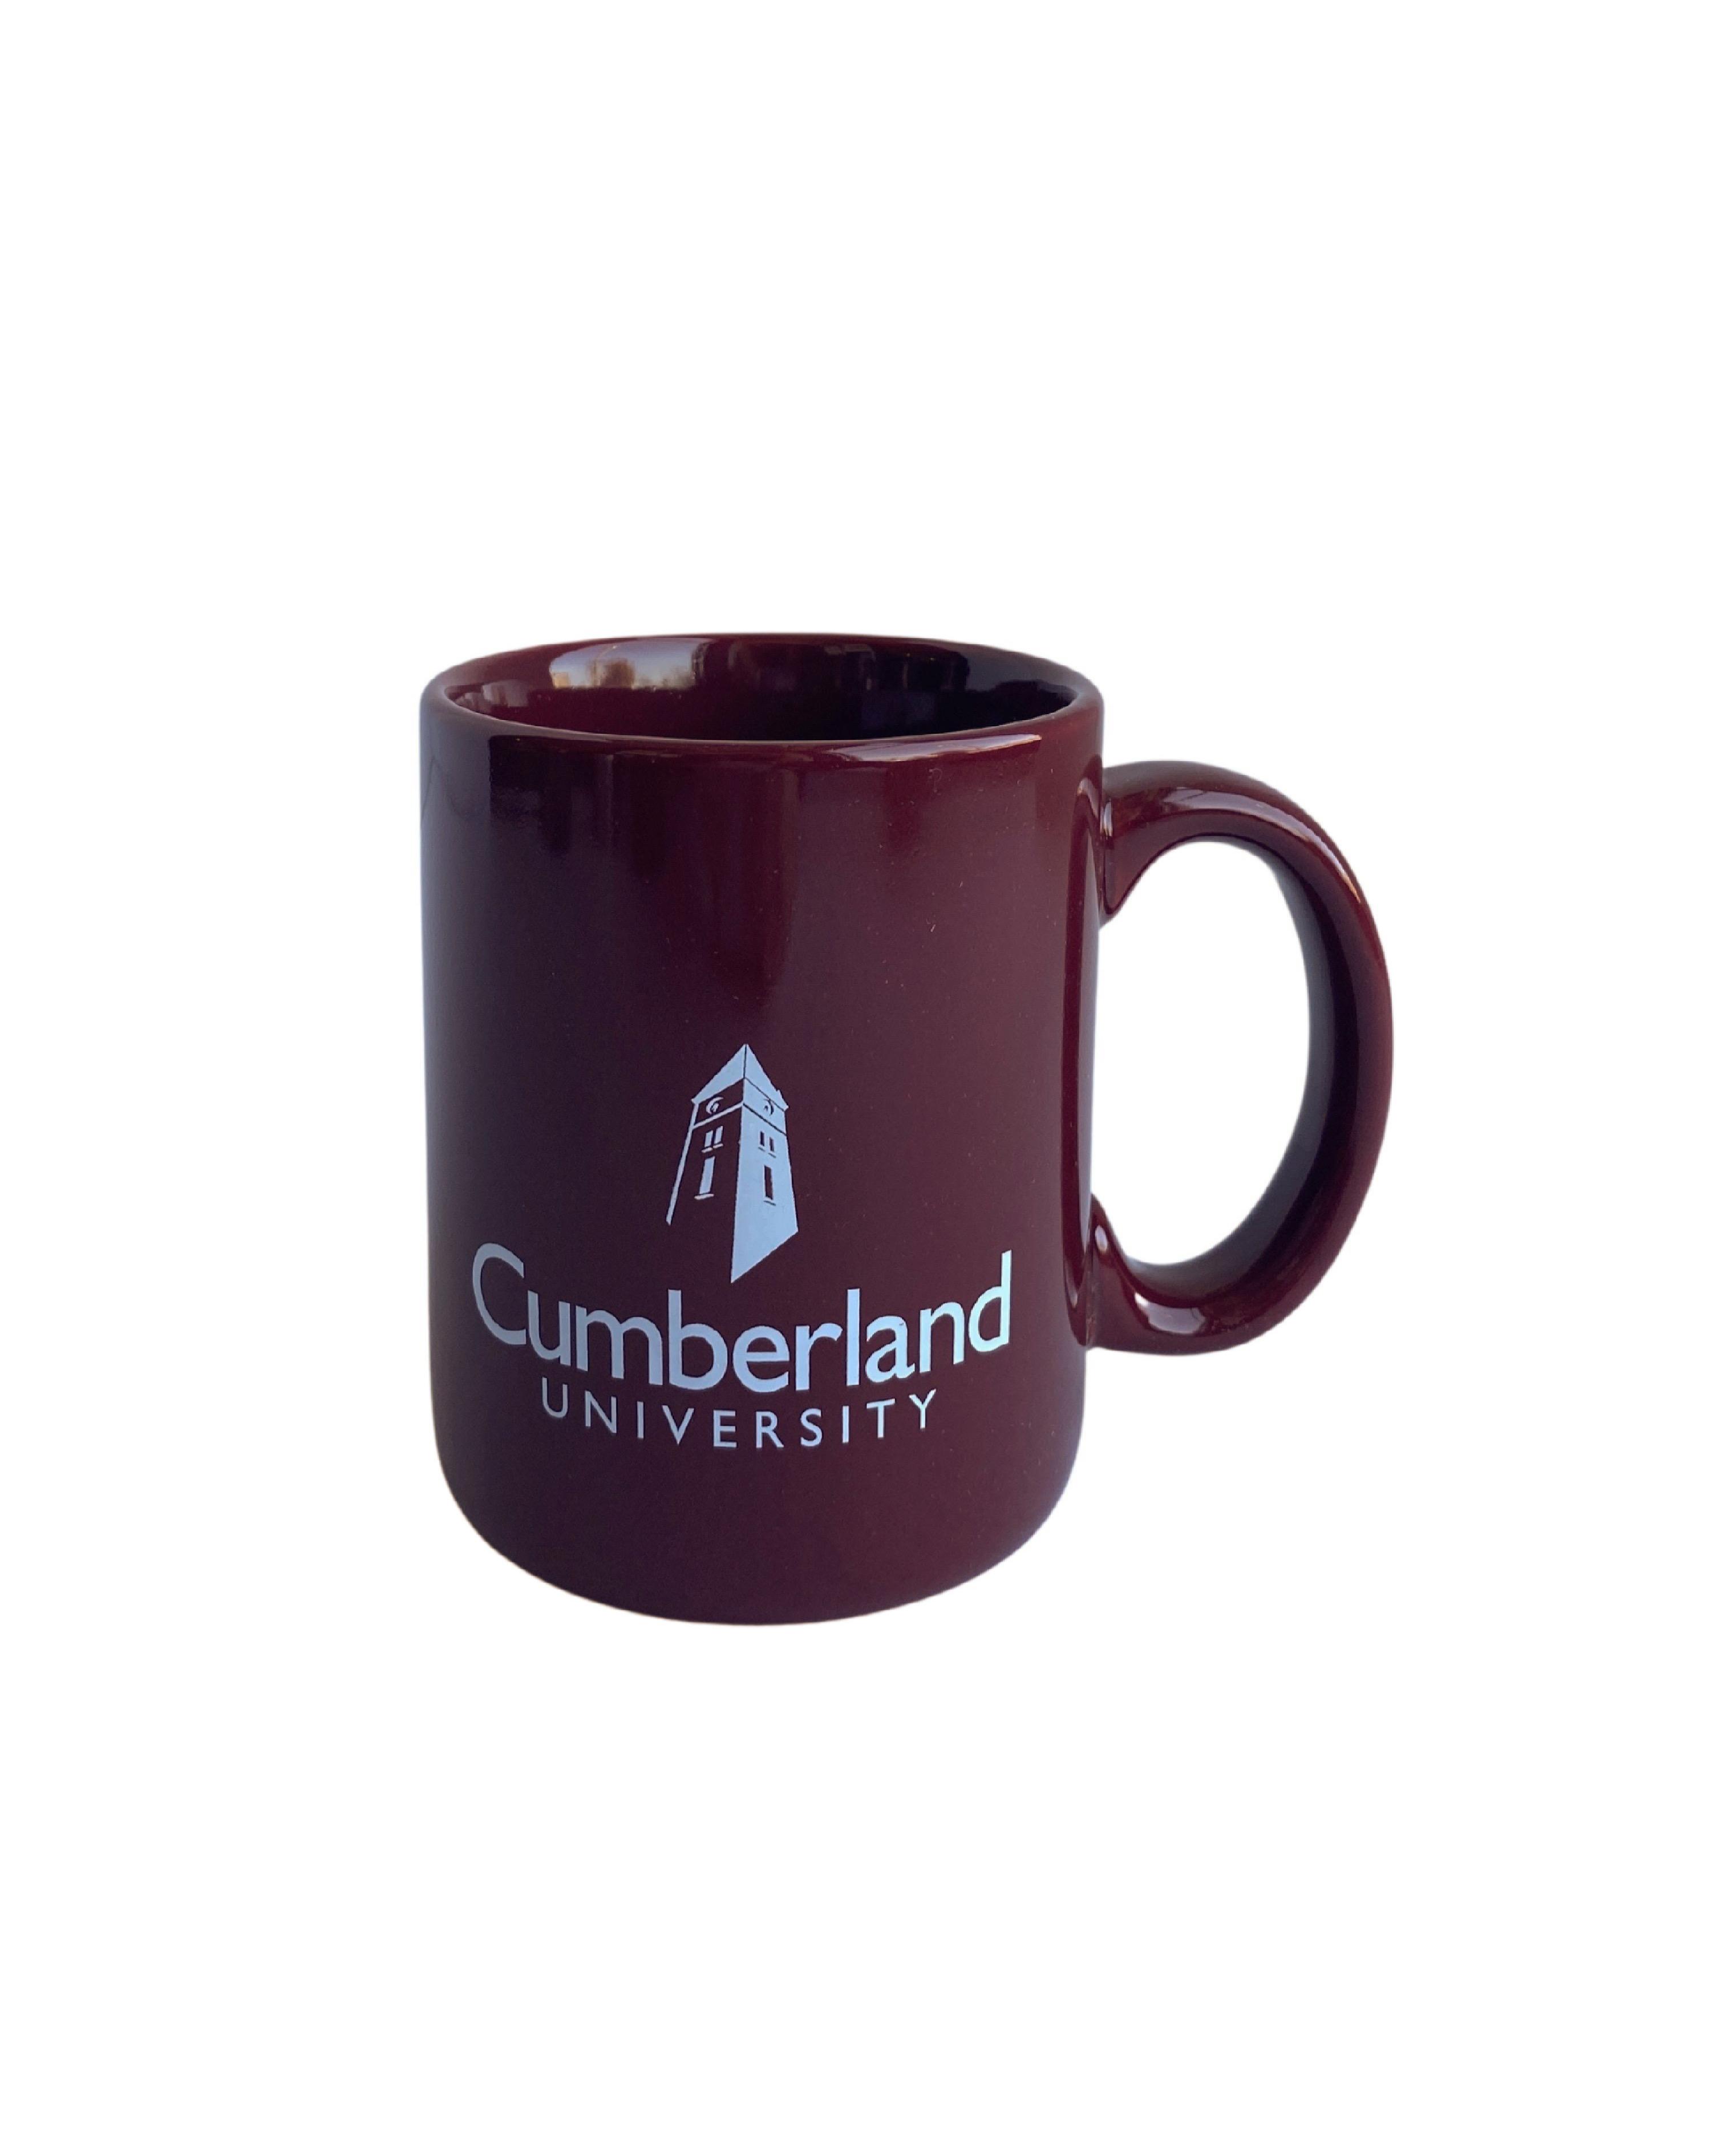 Cumberland University Maroon Mug